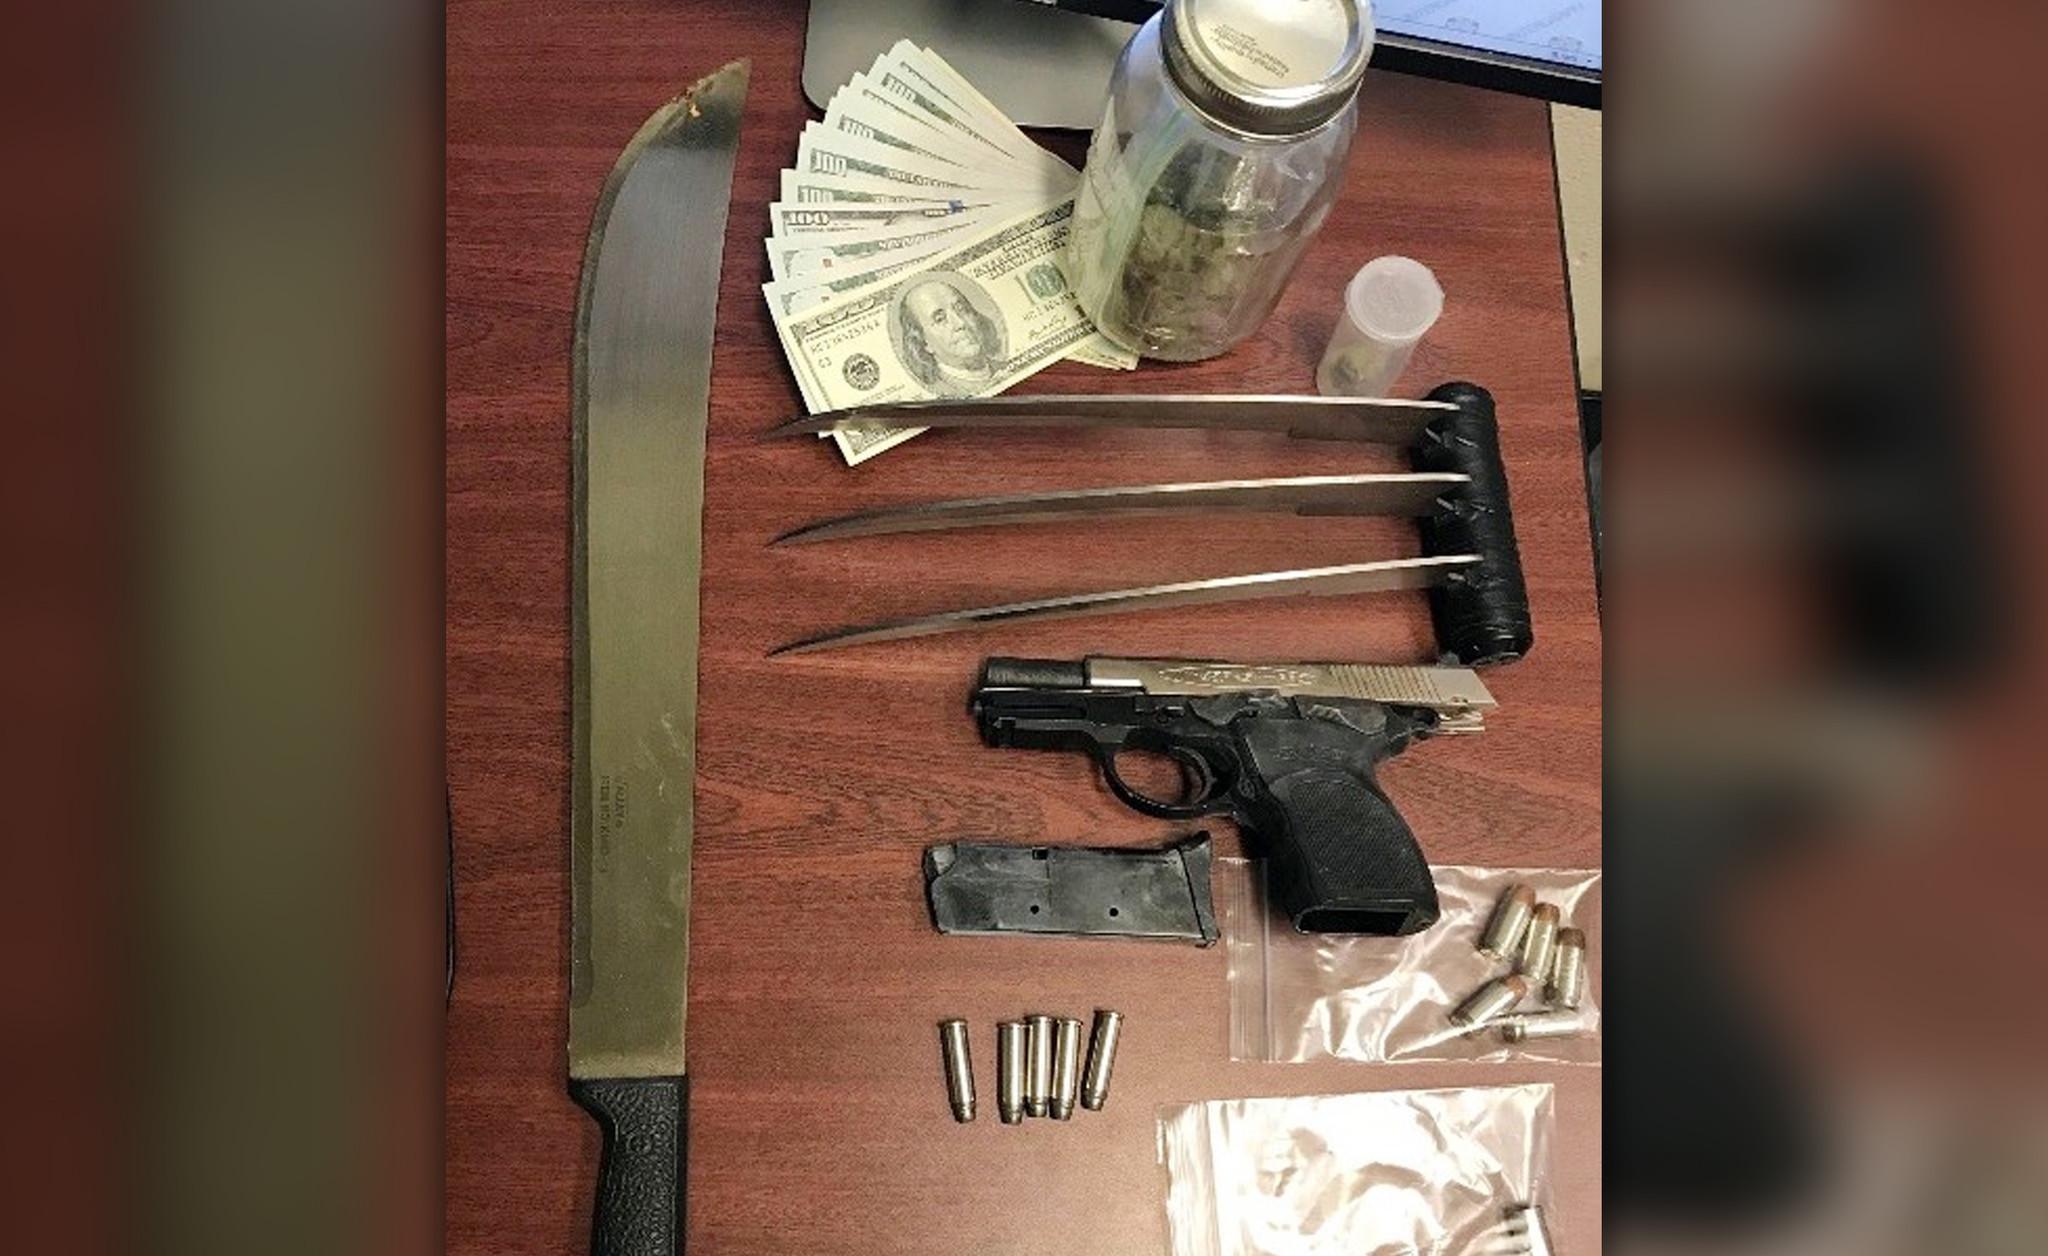 Three blade knife that looks like superhero Wolverine's claw found inside a Bronx home